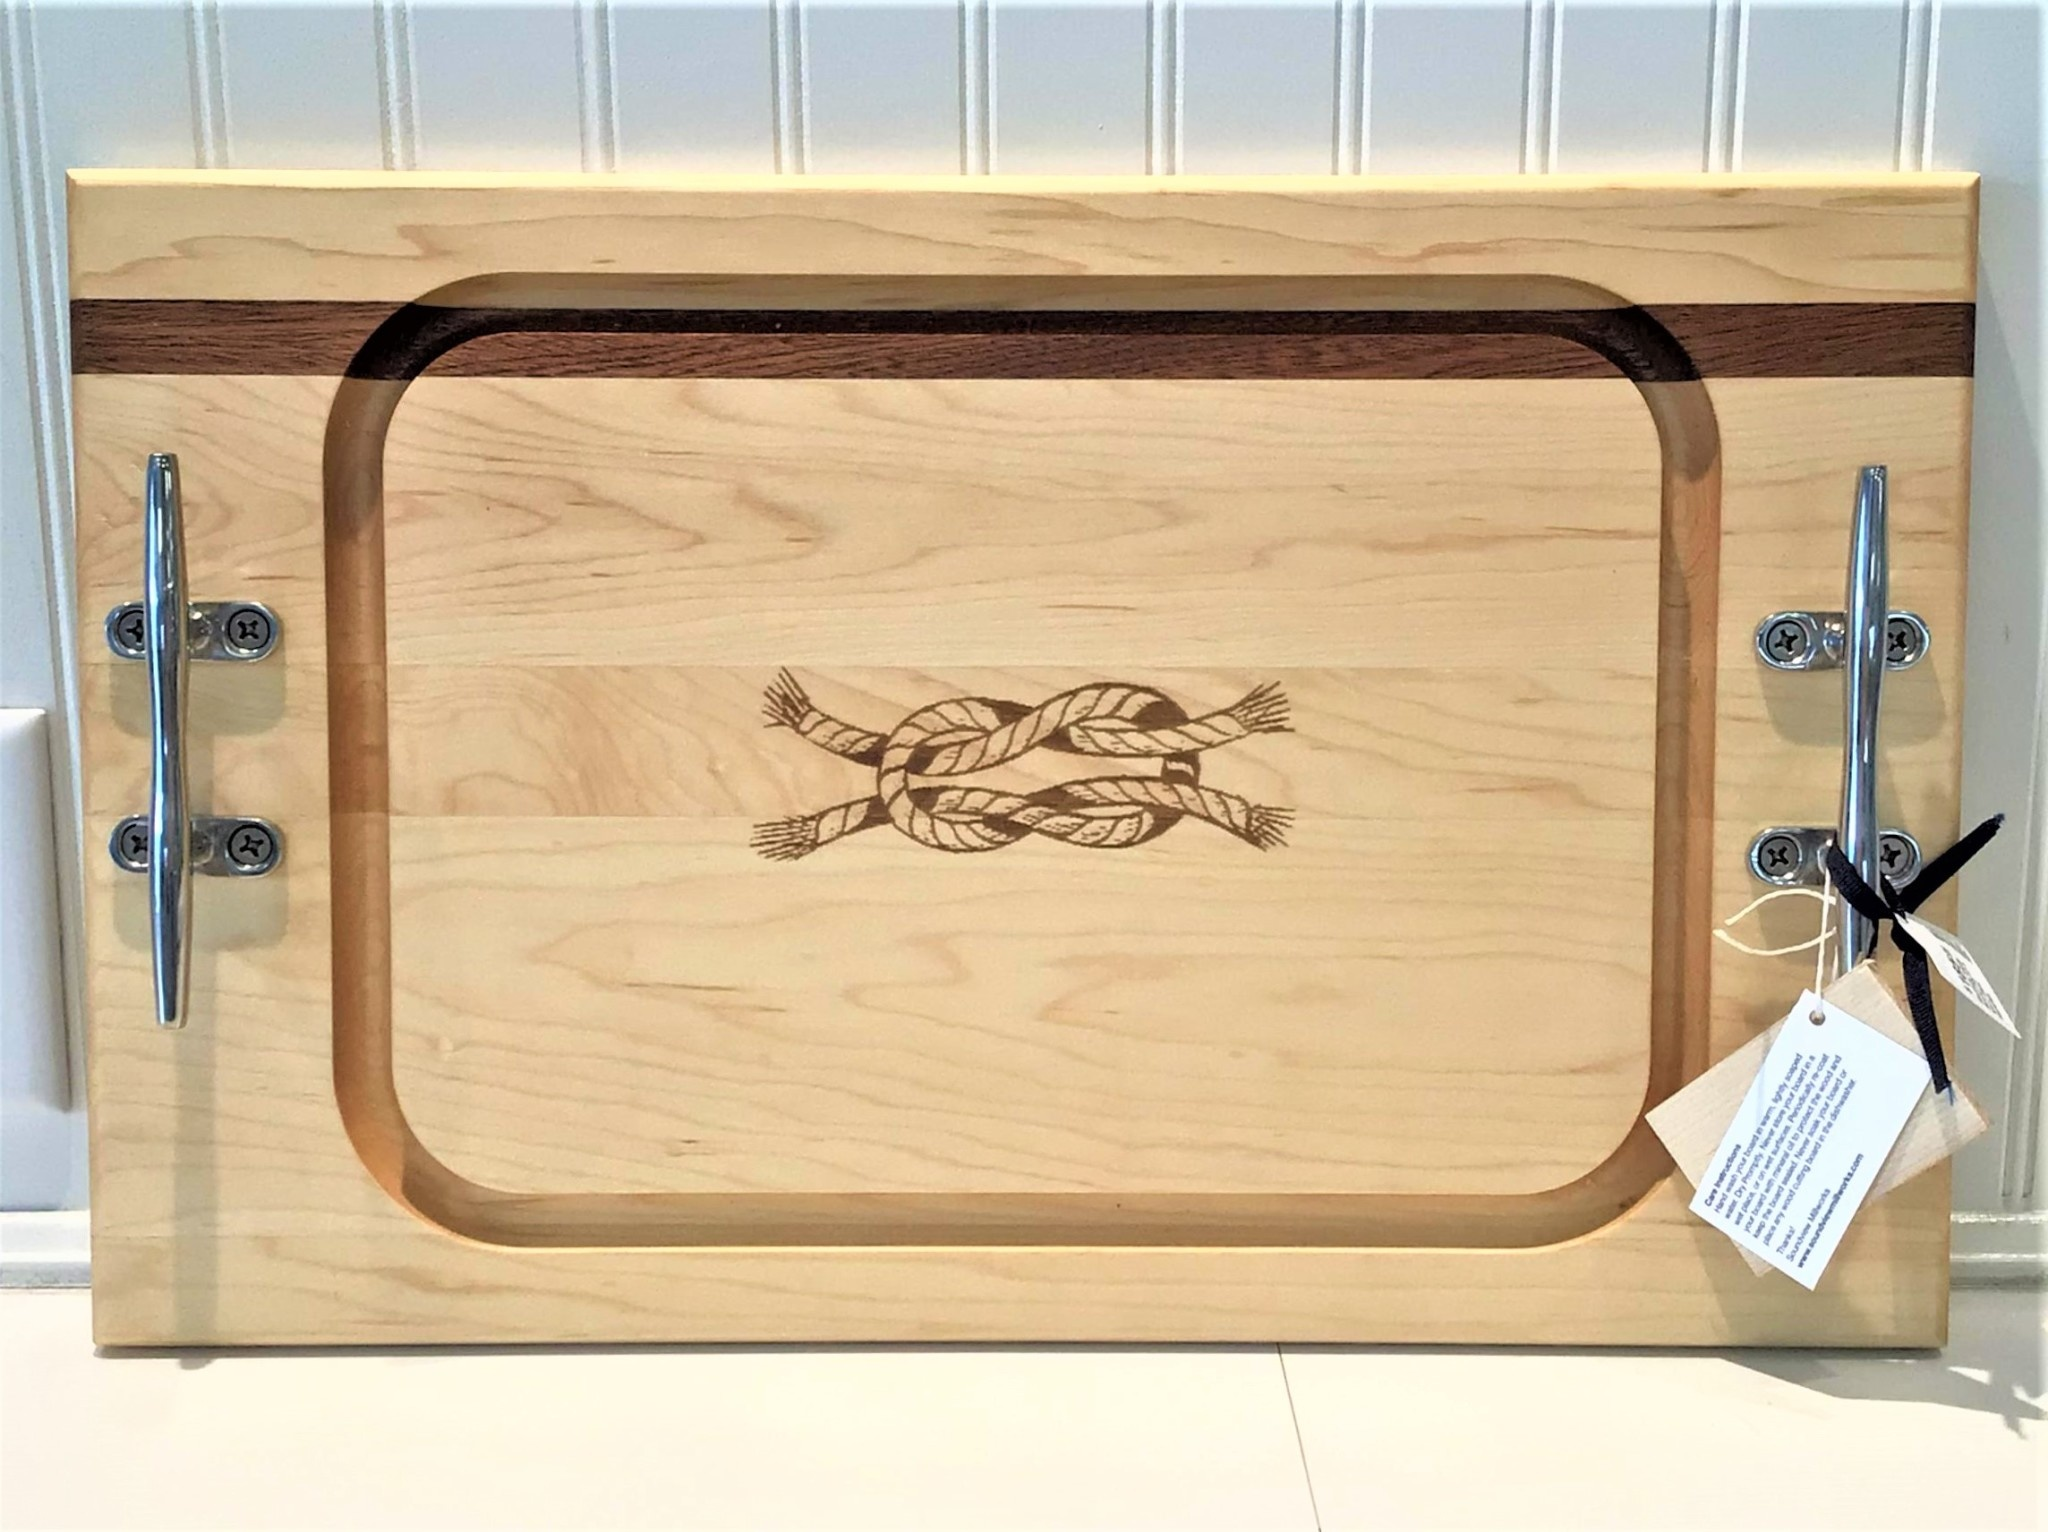 Medium Steak Board 20x12.5 Knot Cleat Handles